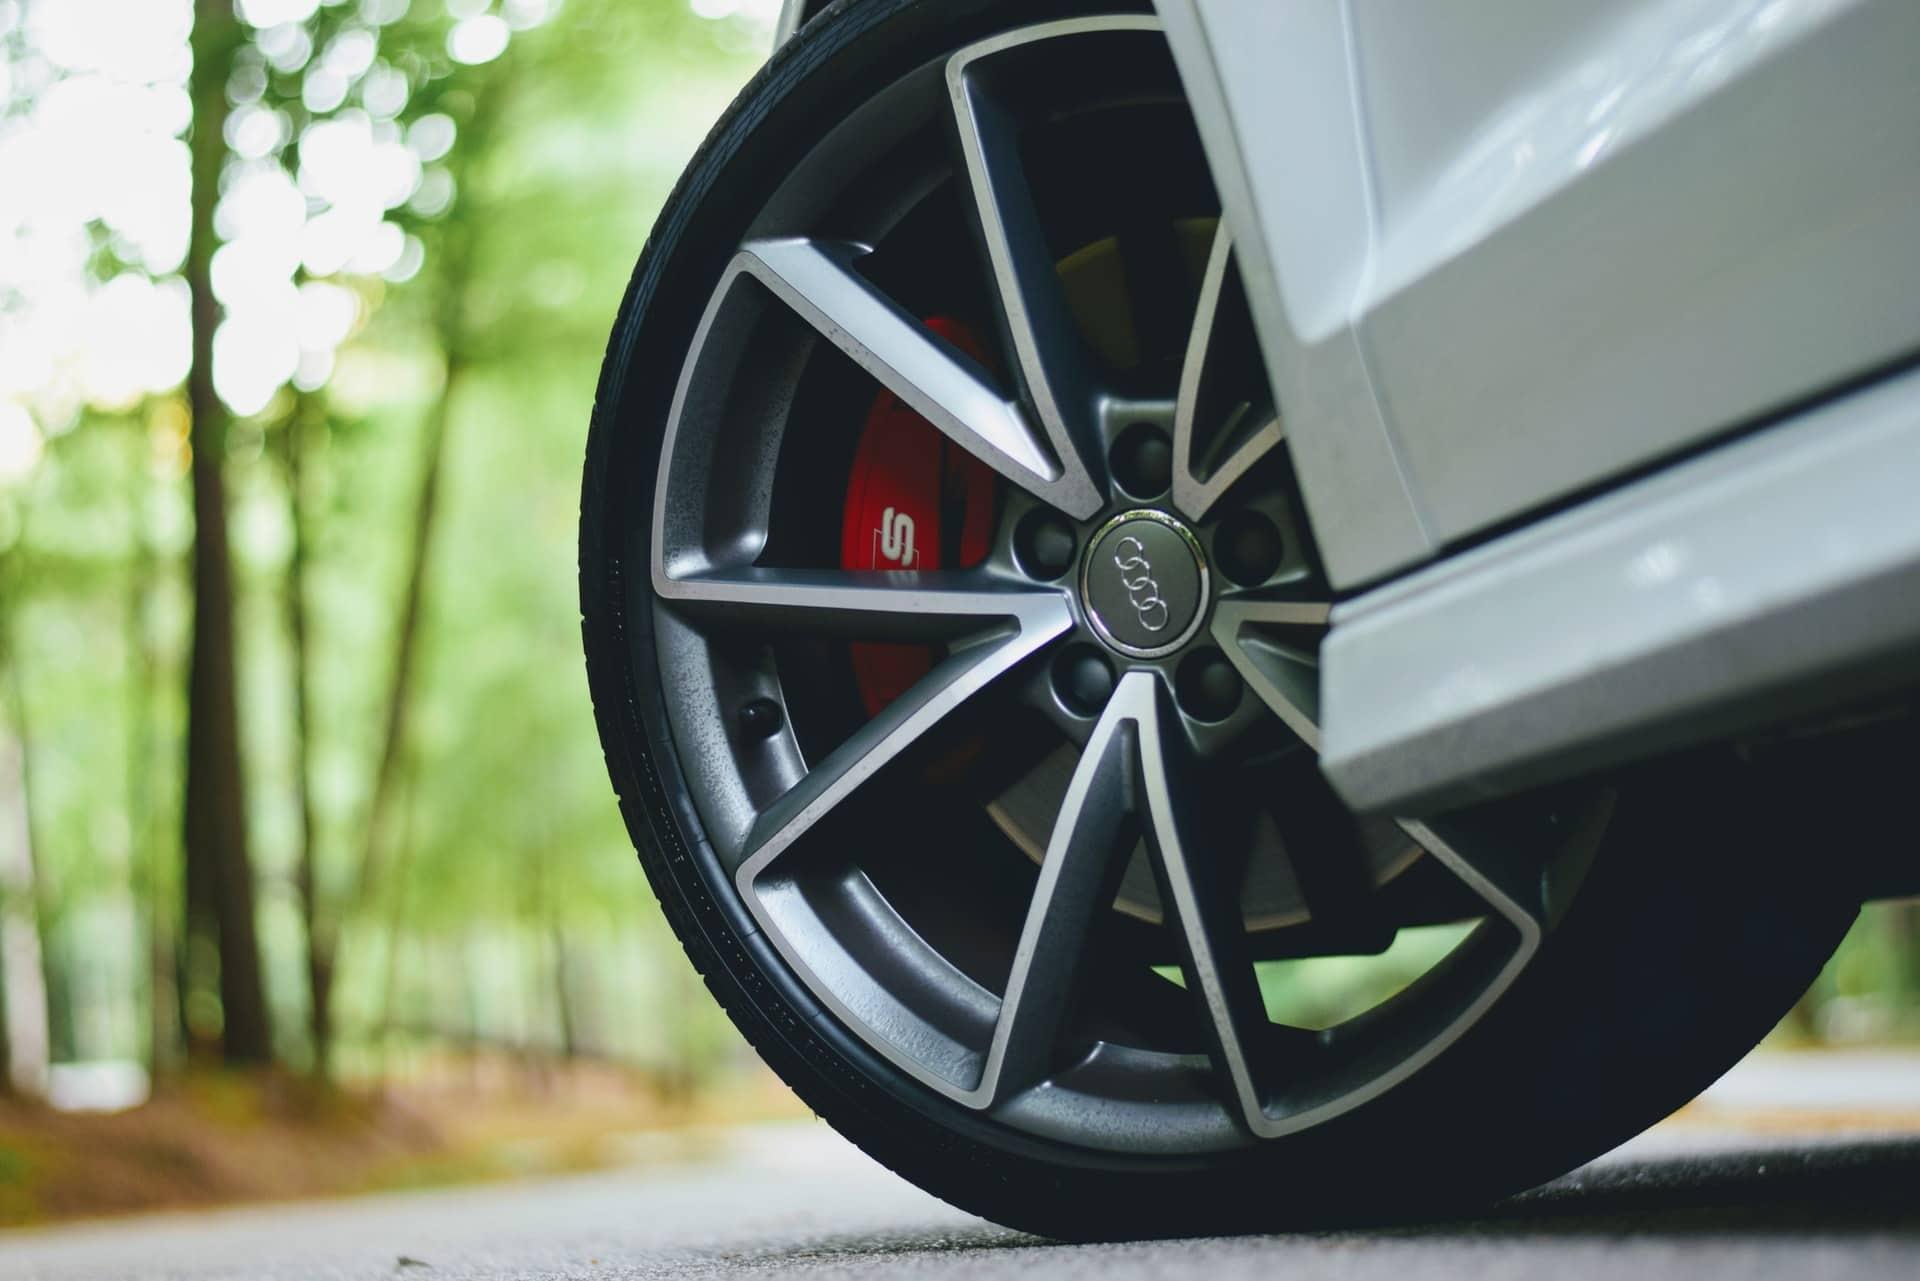 Closeup of a tire on an Audi